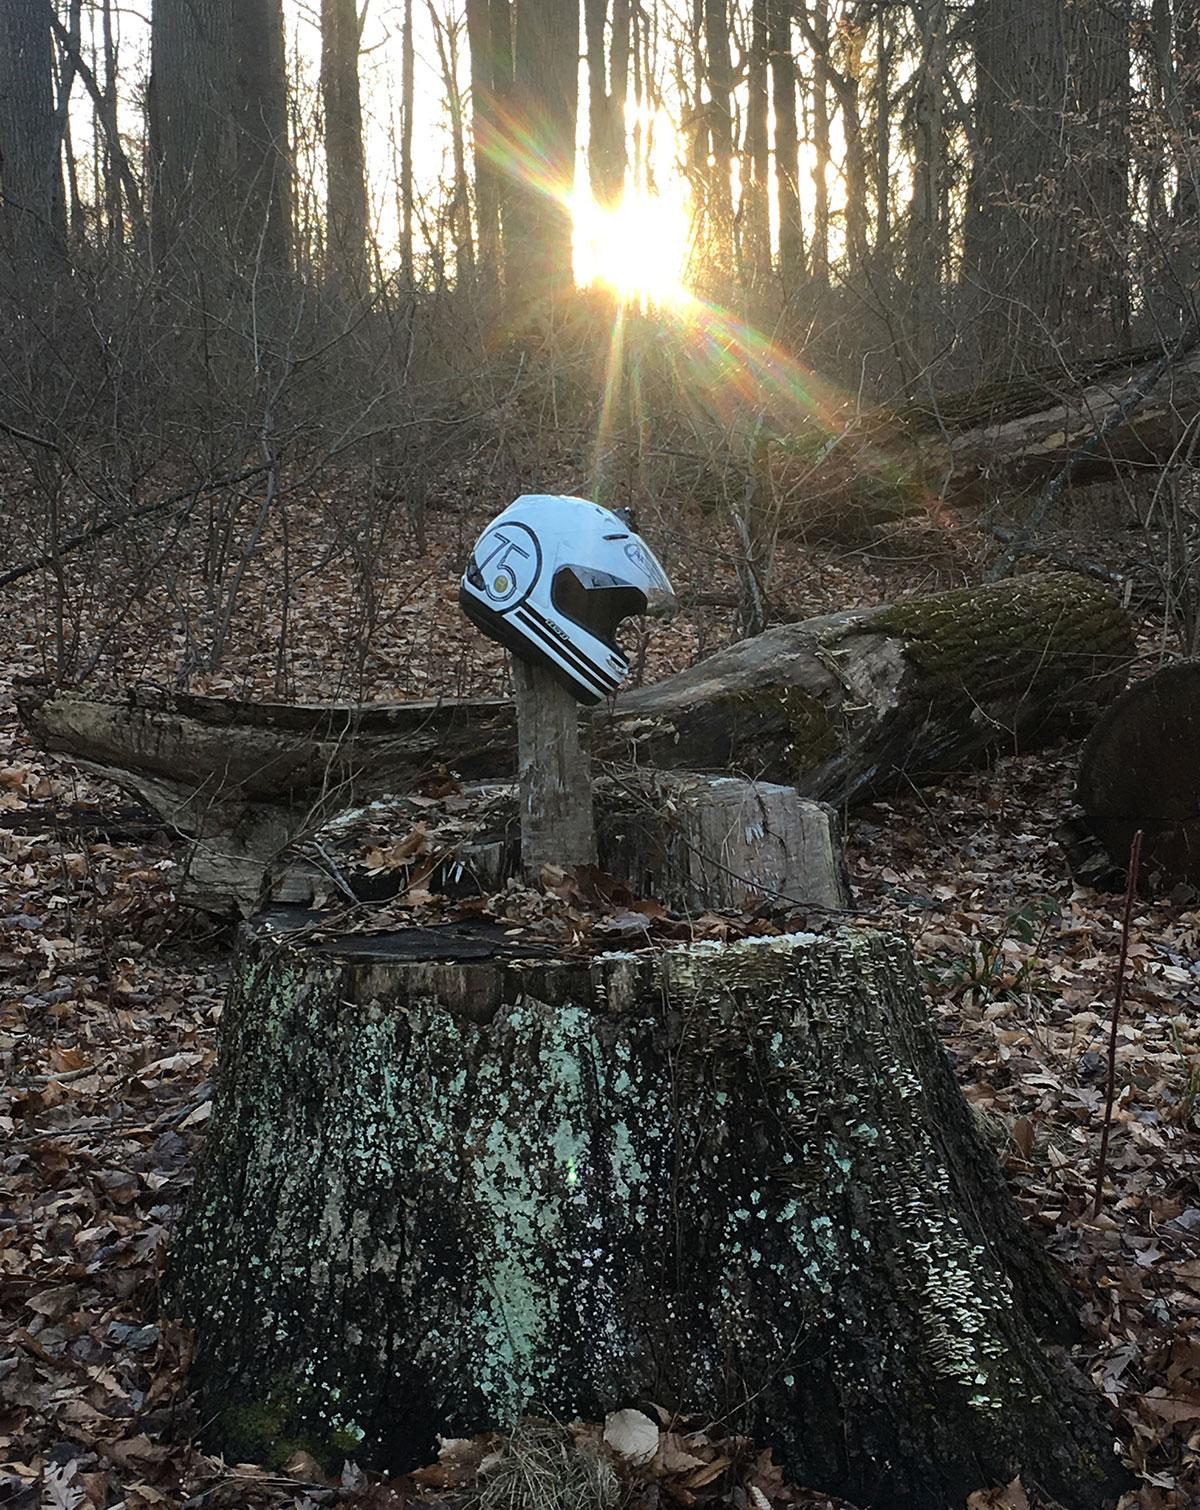 Arai Helmet in the woods